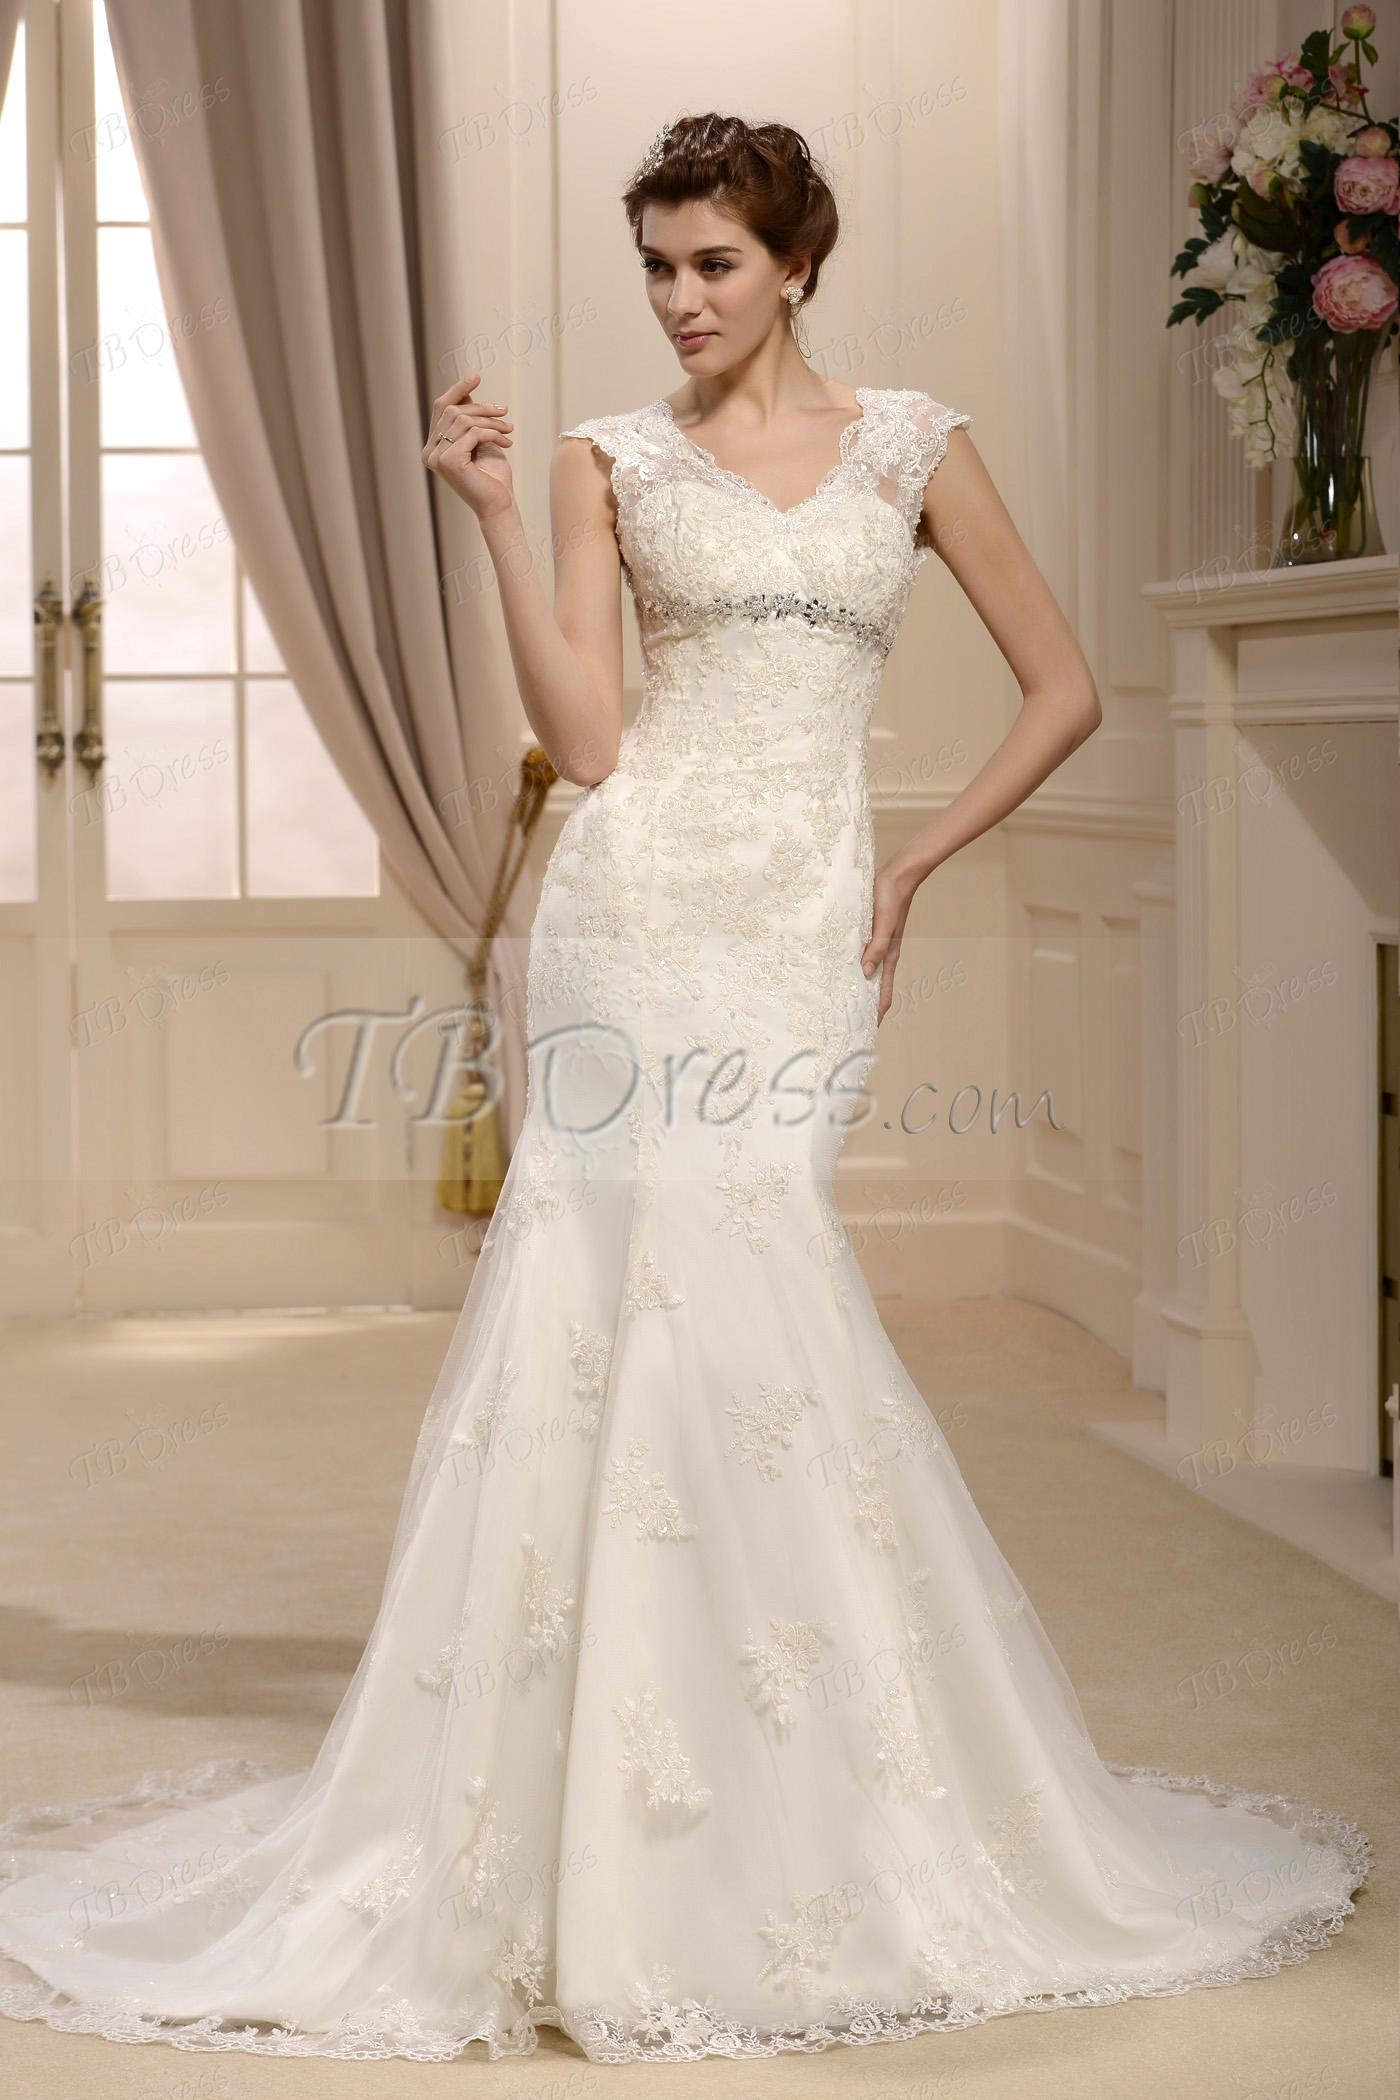 abiti da sposa in pizzo theFashiondiet fashion blog style wedding